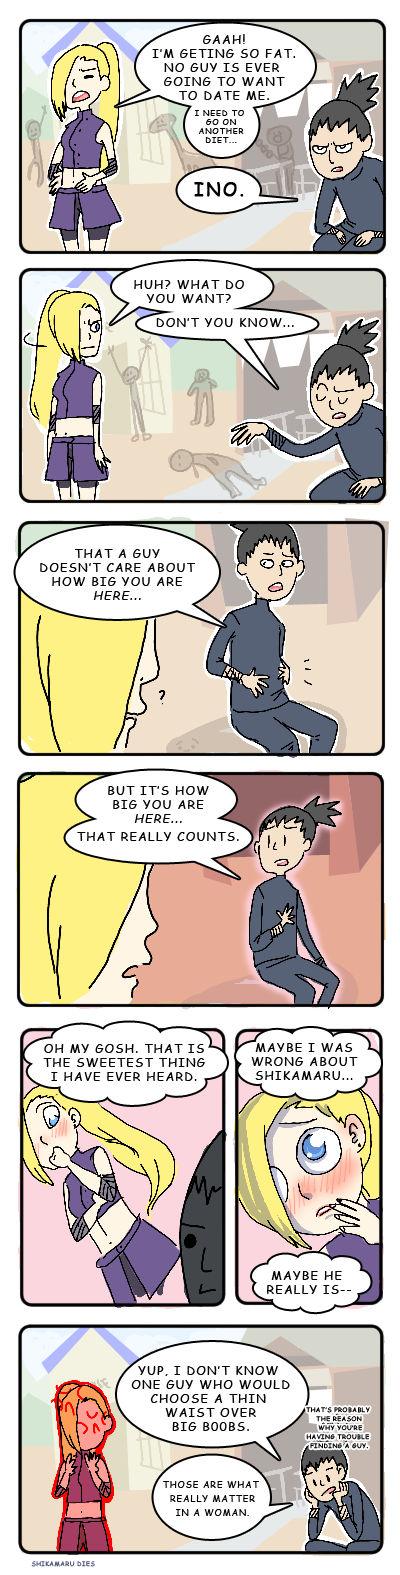 Shikamaru's love